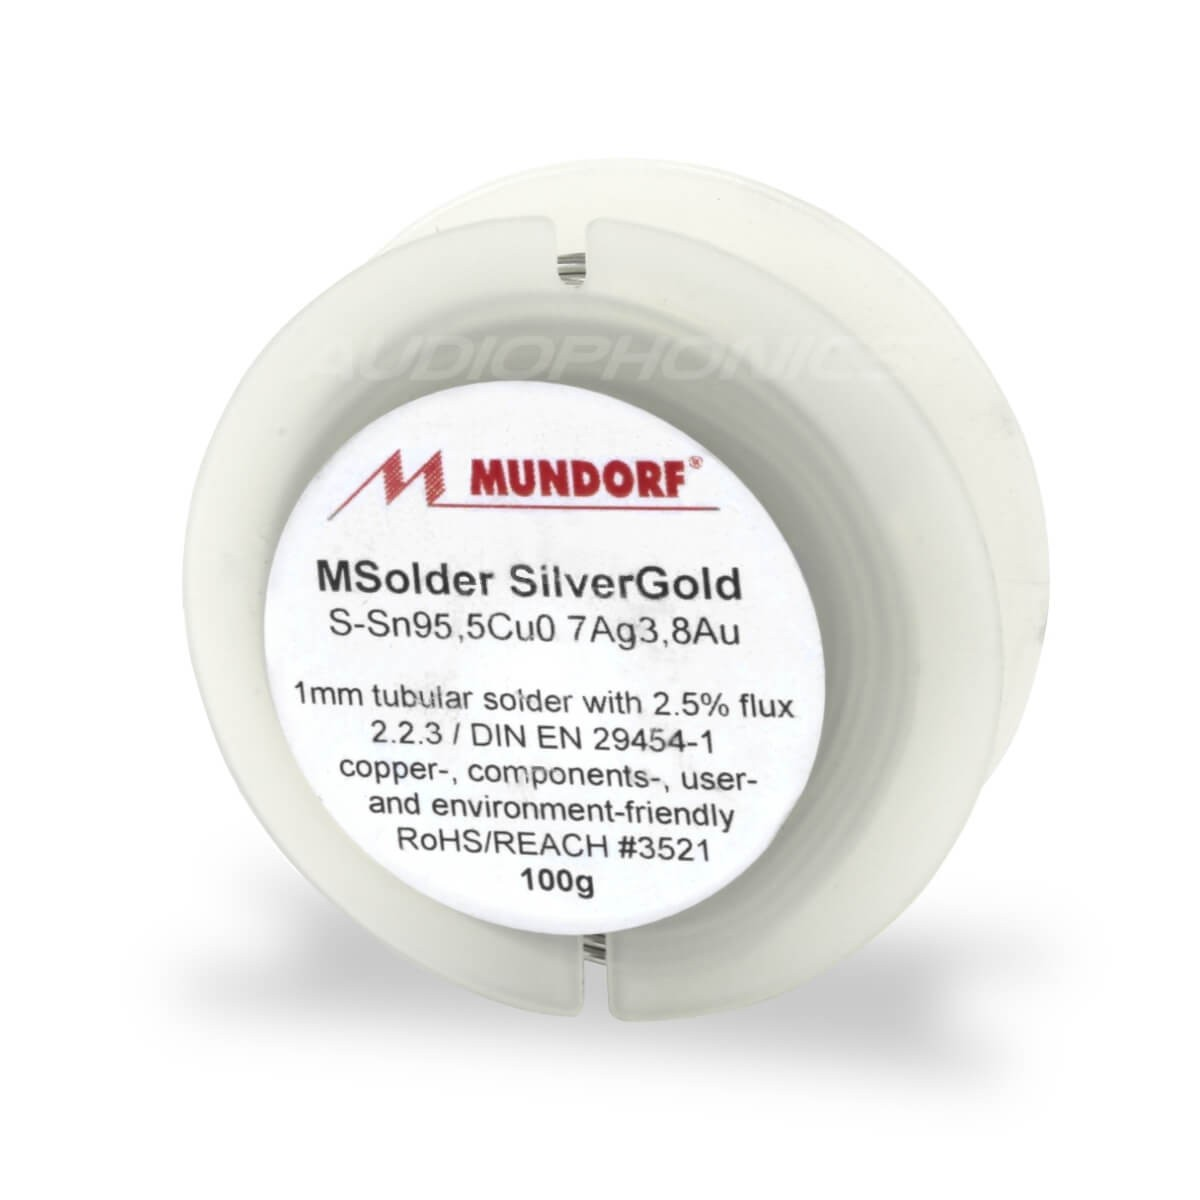 Soldering tin - Mundorf Silver-Gold 4% (2 meters)